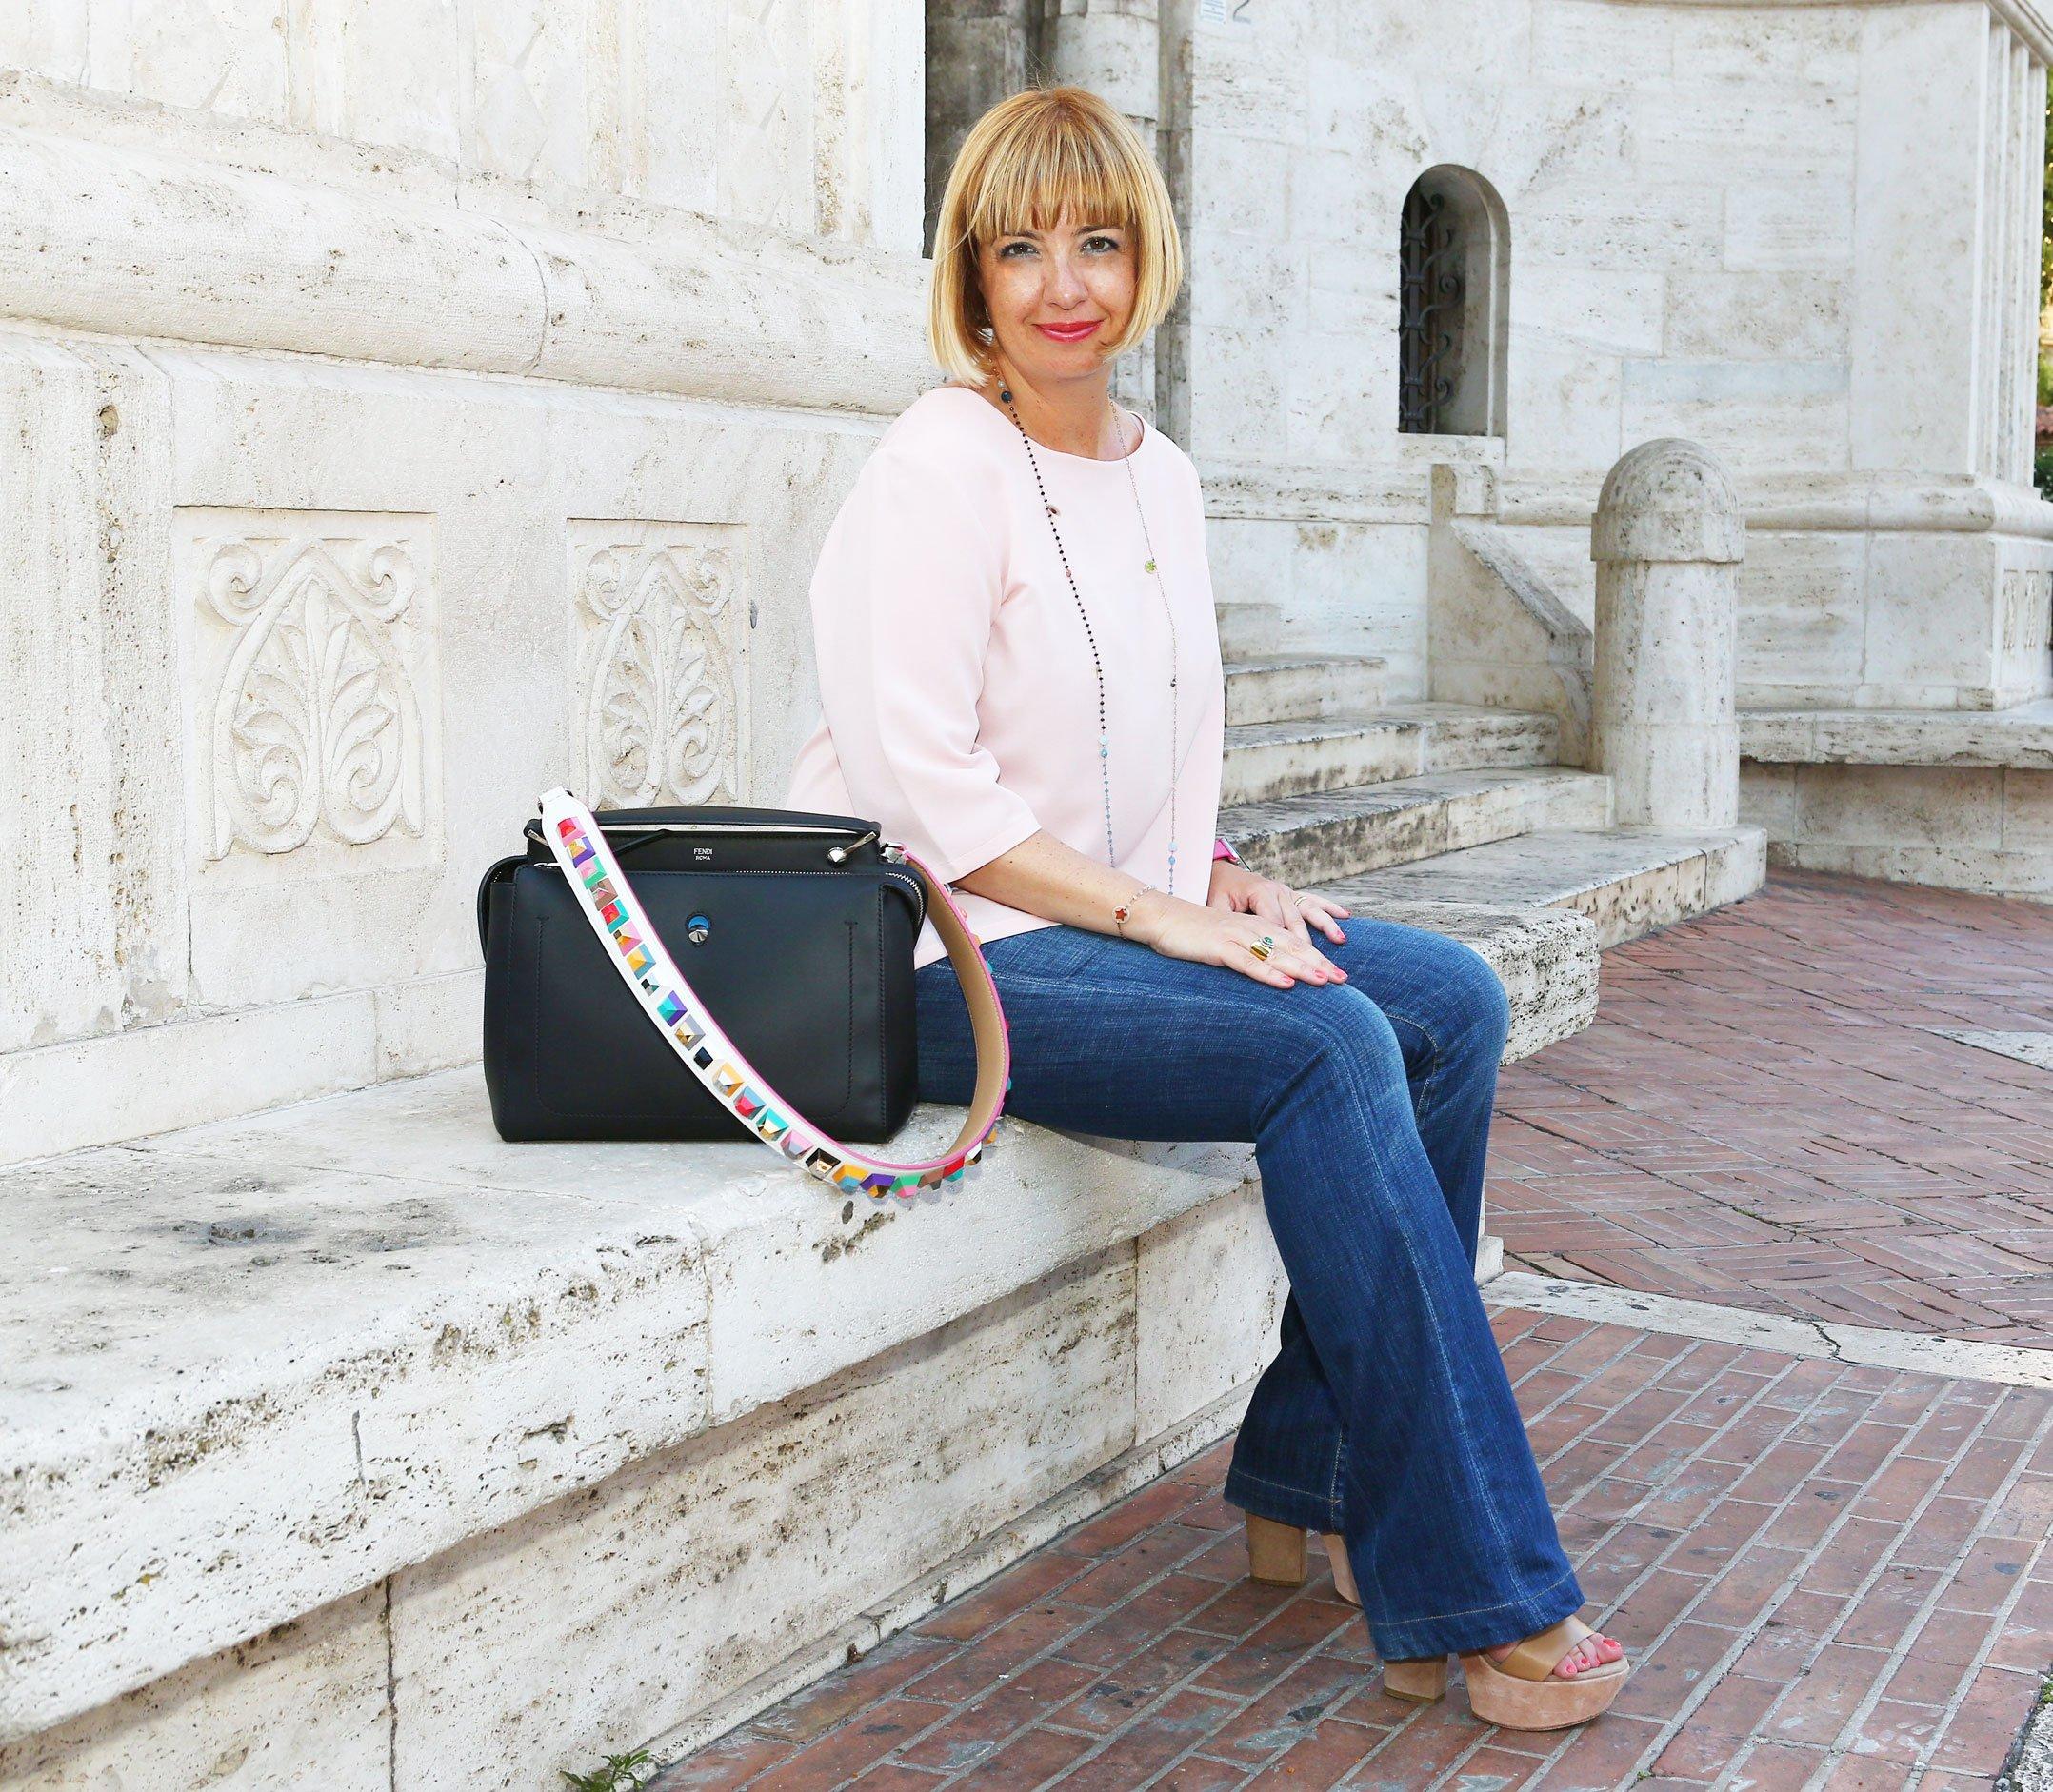 Claudia con la borsa Fendi DotCom